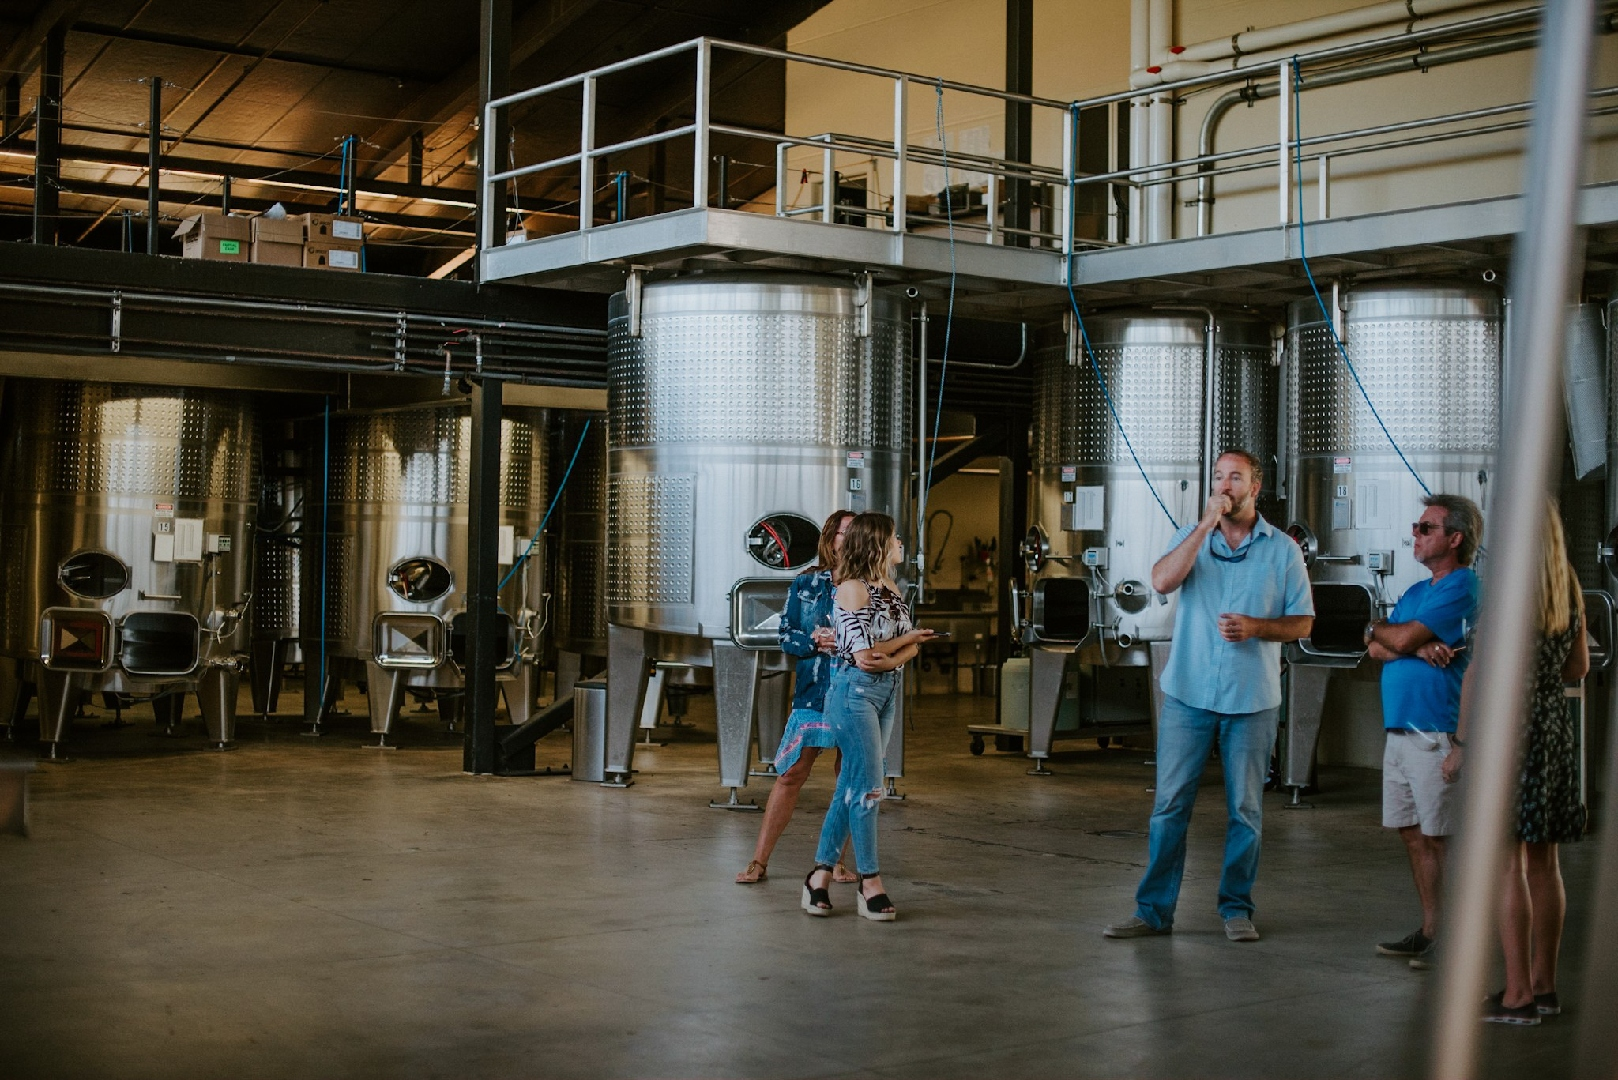 Medlock Ames winery visit